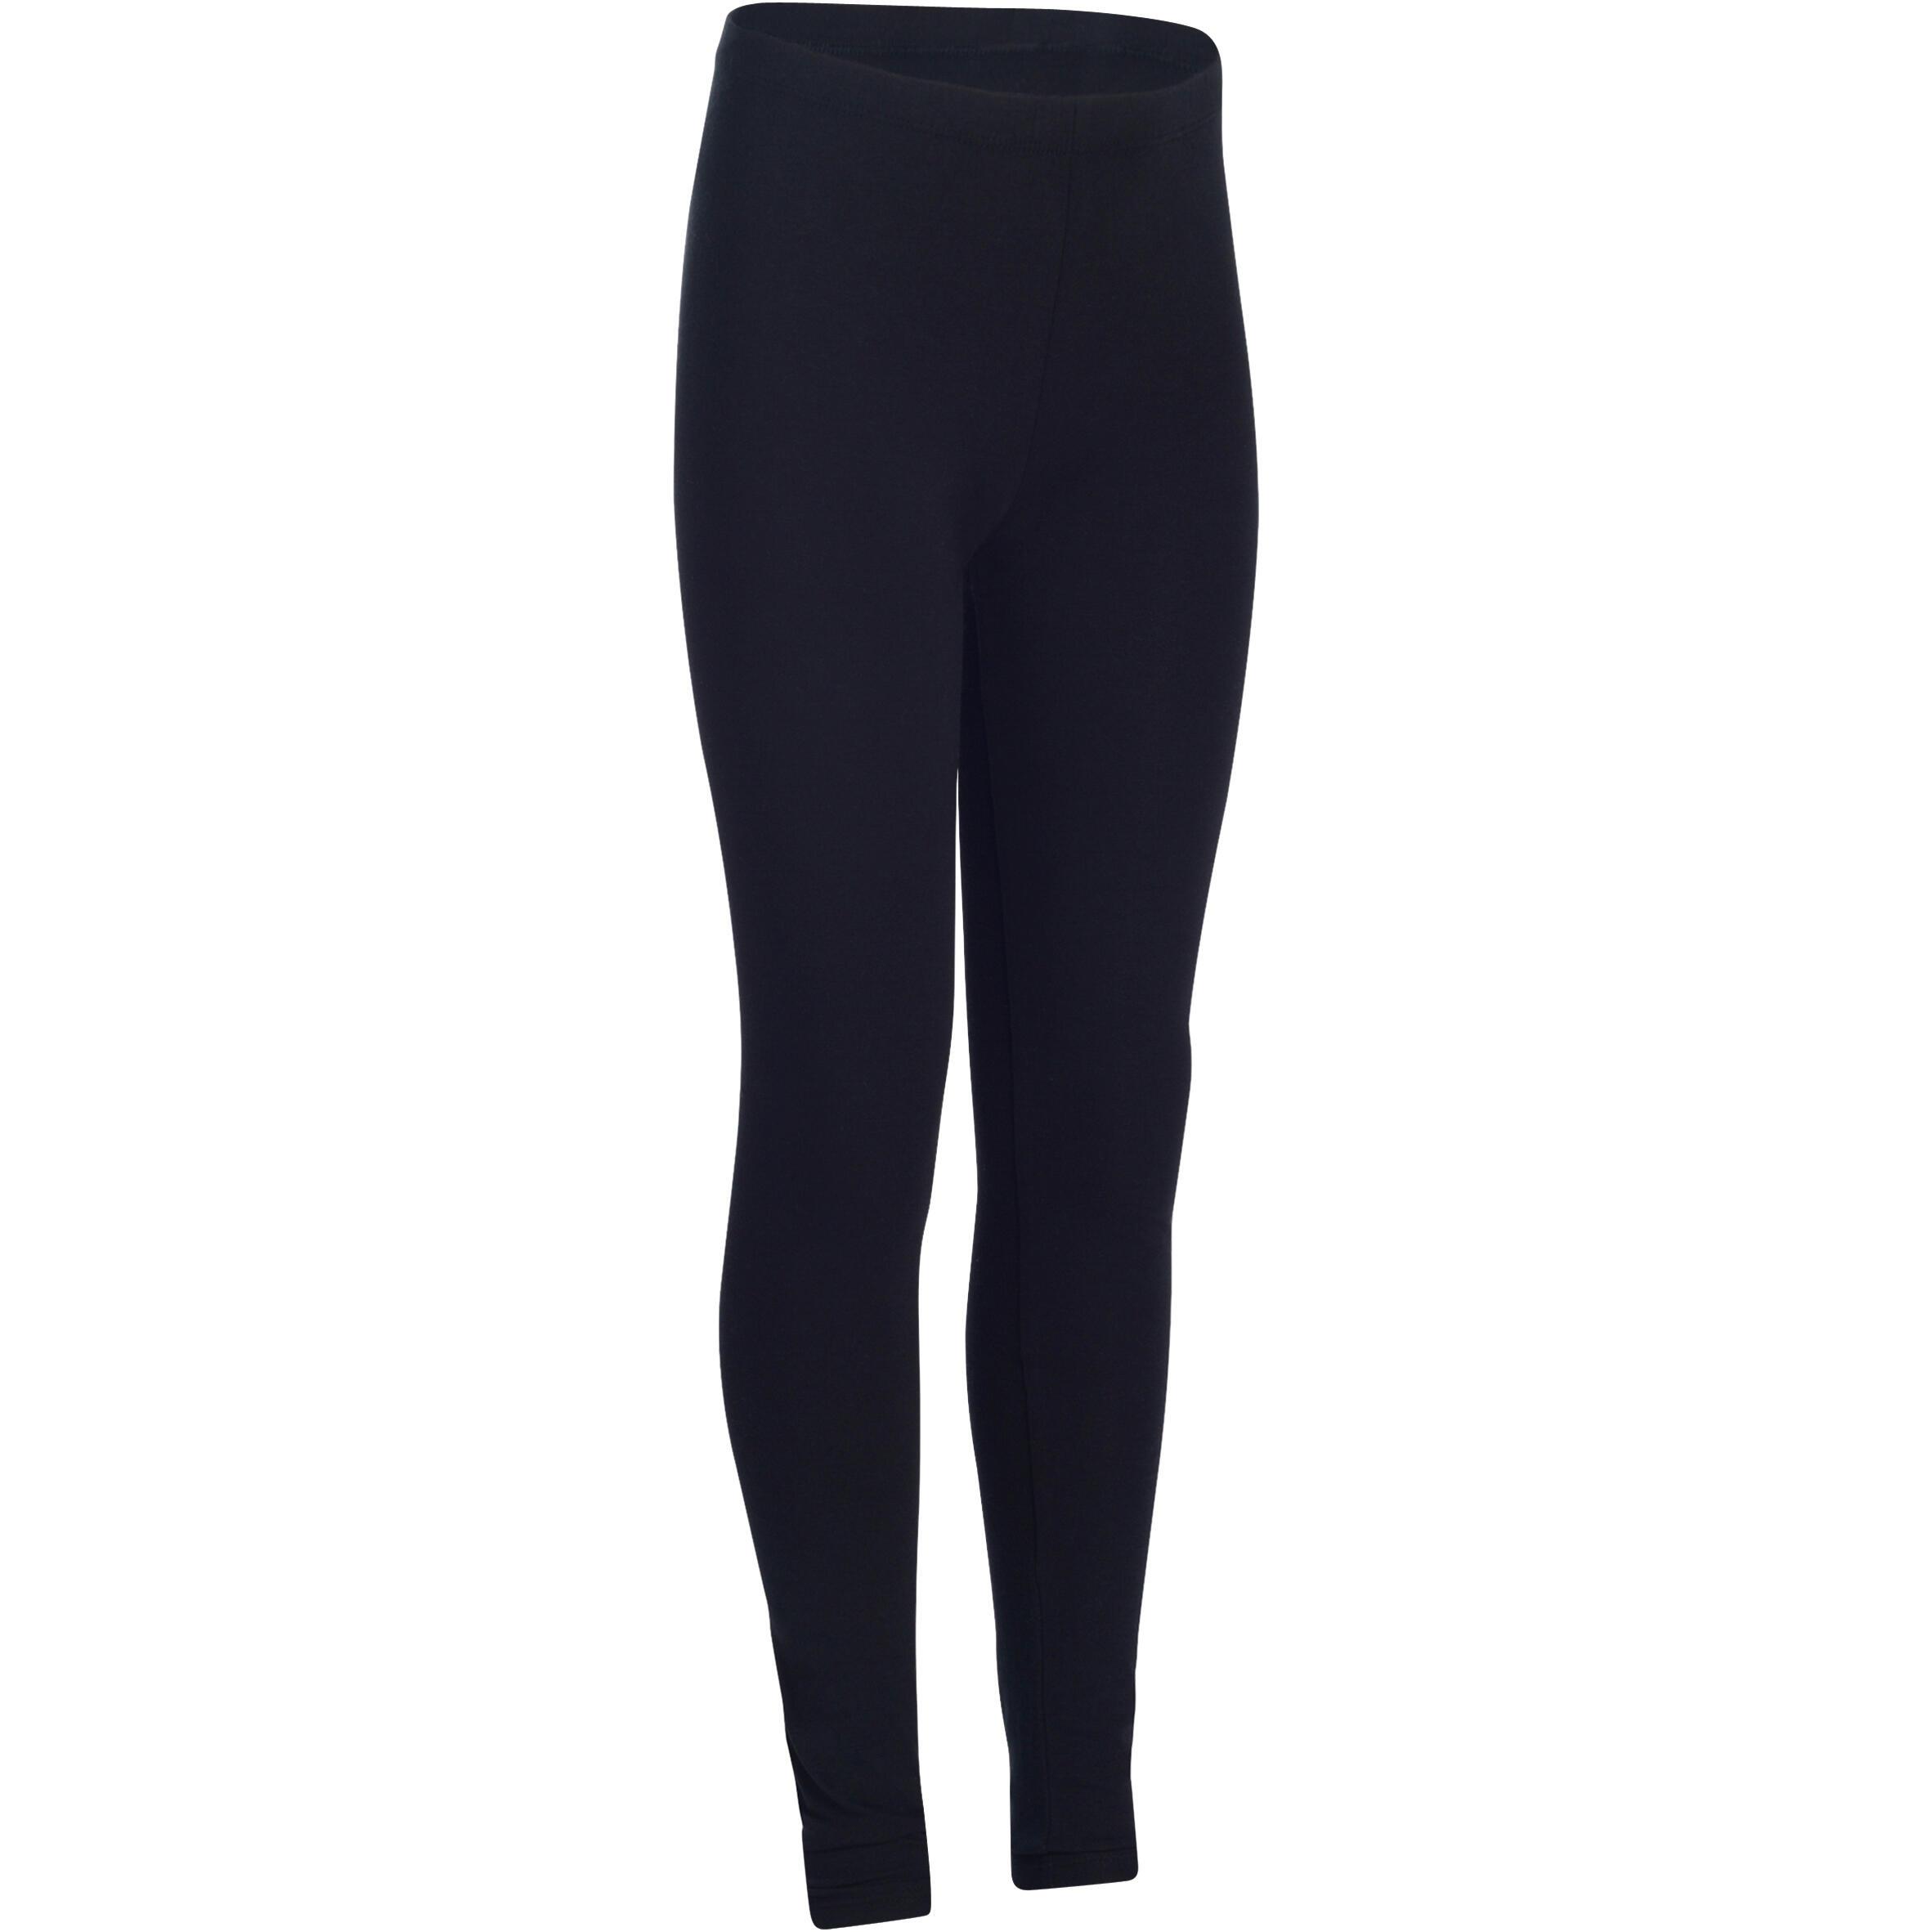 6b2a91af047 Domyos Legging 100 meisjes GYM KINDEREN zwart | Decathlon